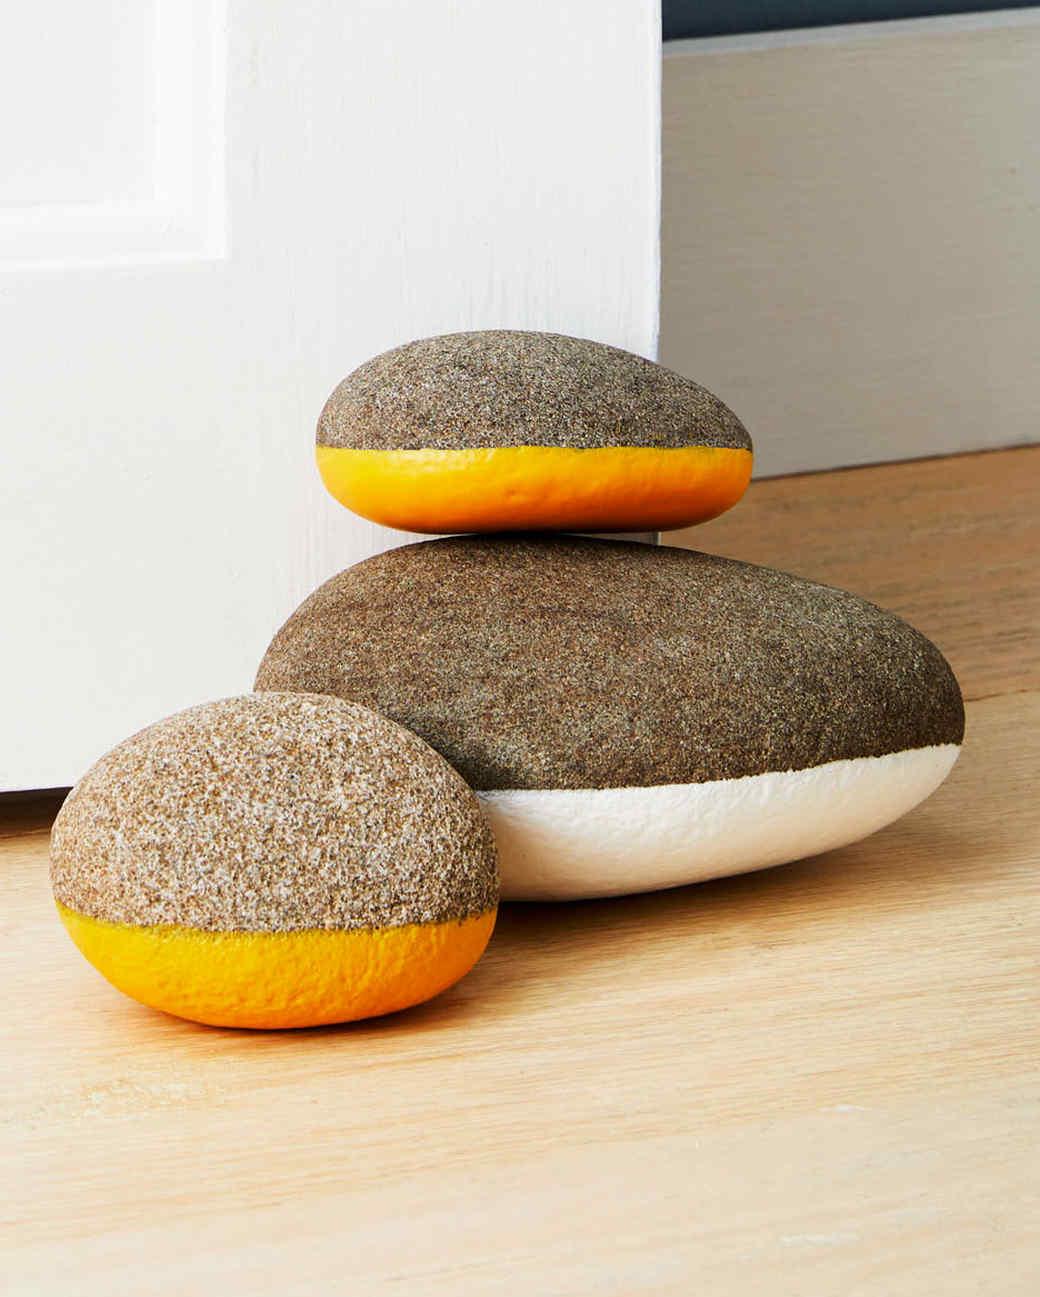 rubber coating rocks